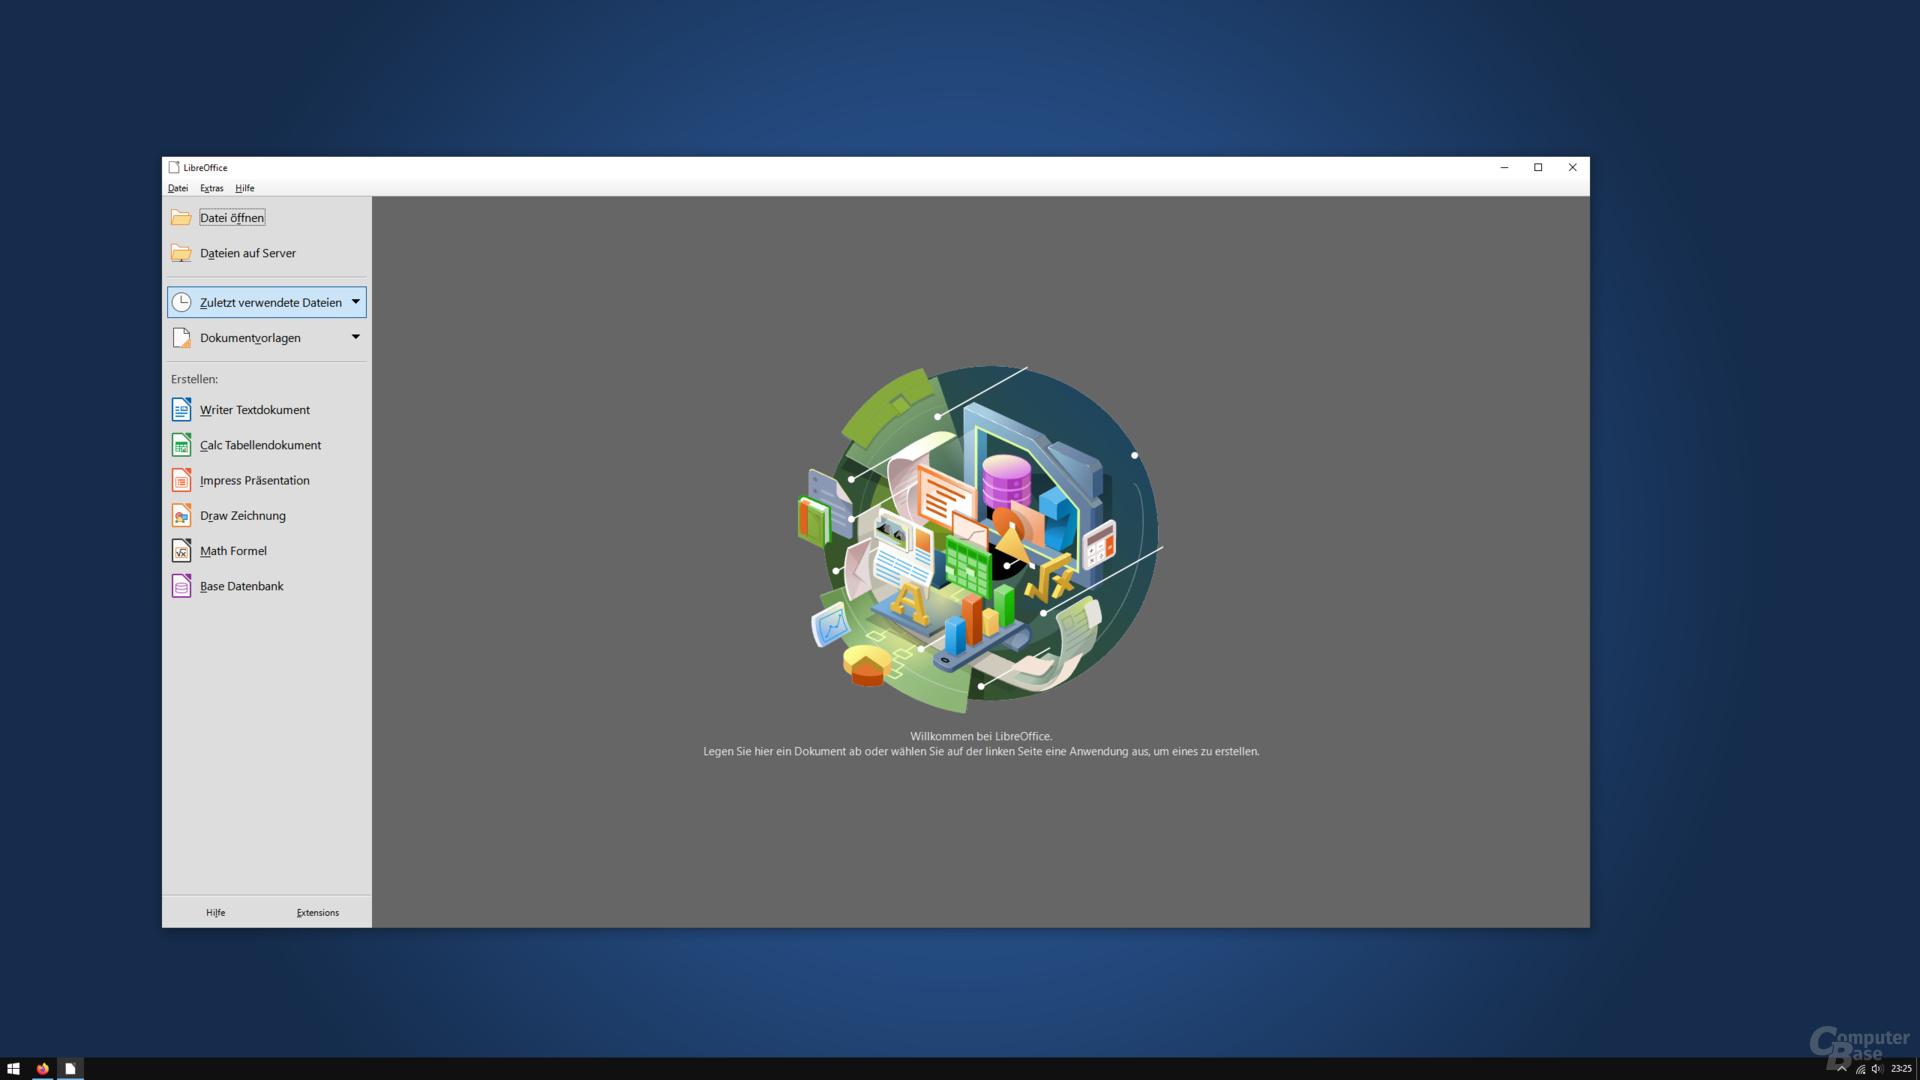 LibreOffice 7.0.0.3 – Startbildschirm